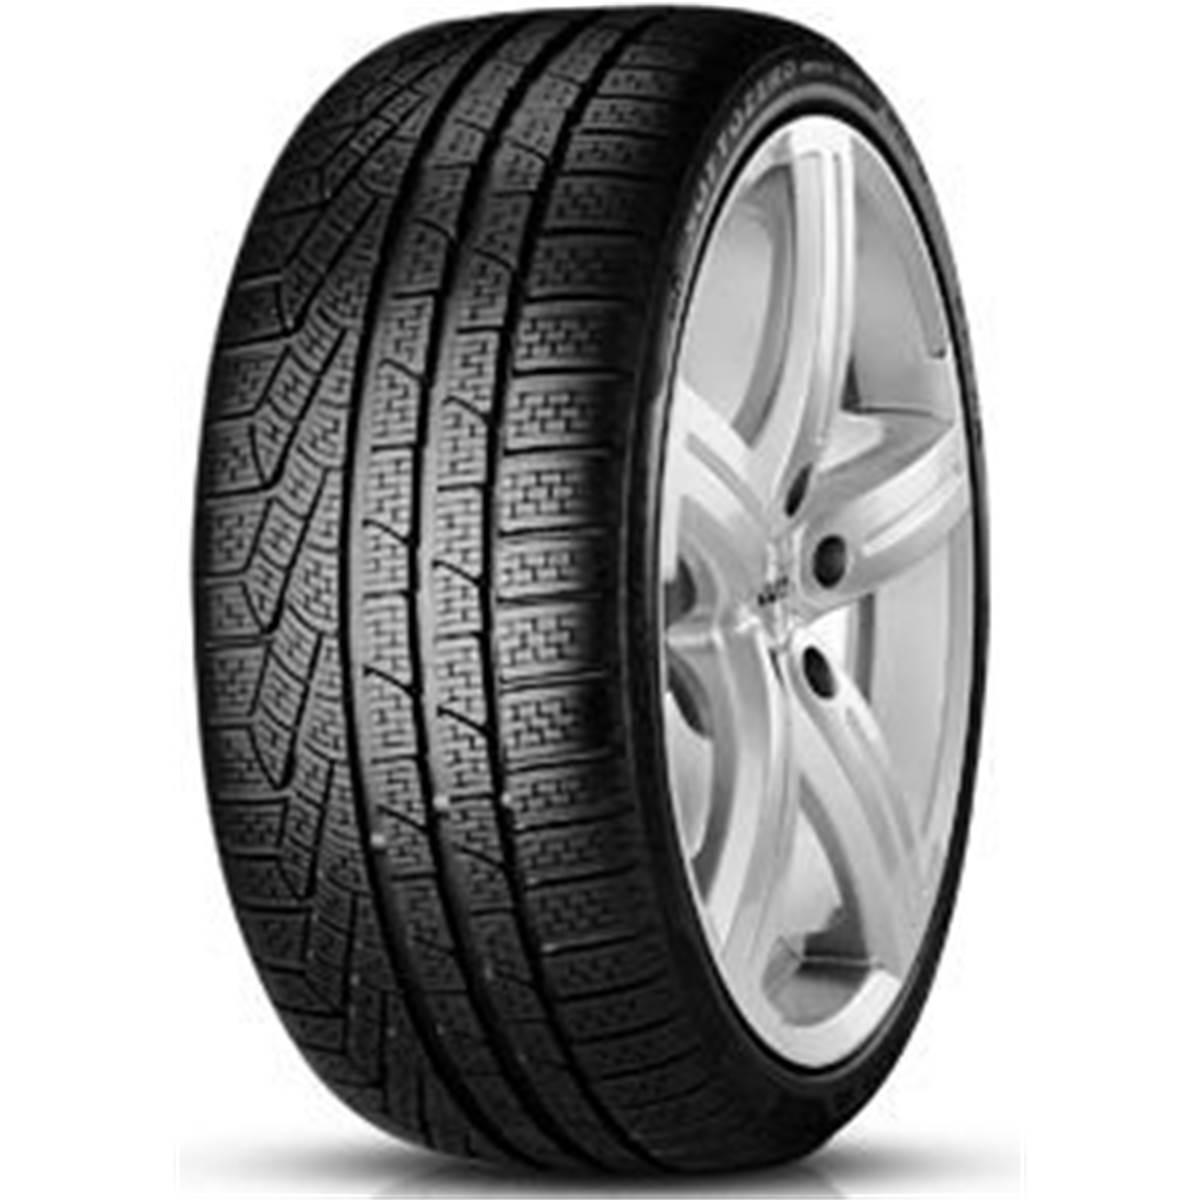 Pneu Hiver Pirelli 235/50R17 96V Winter 240 Sottozero Ii